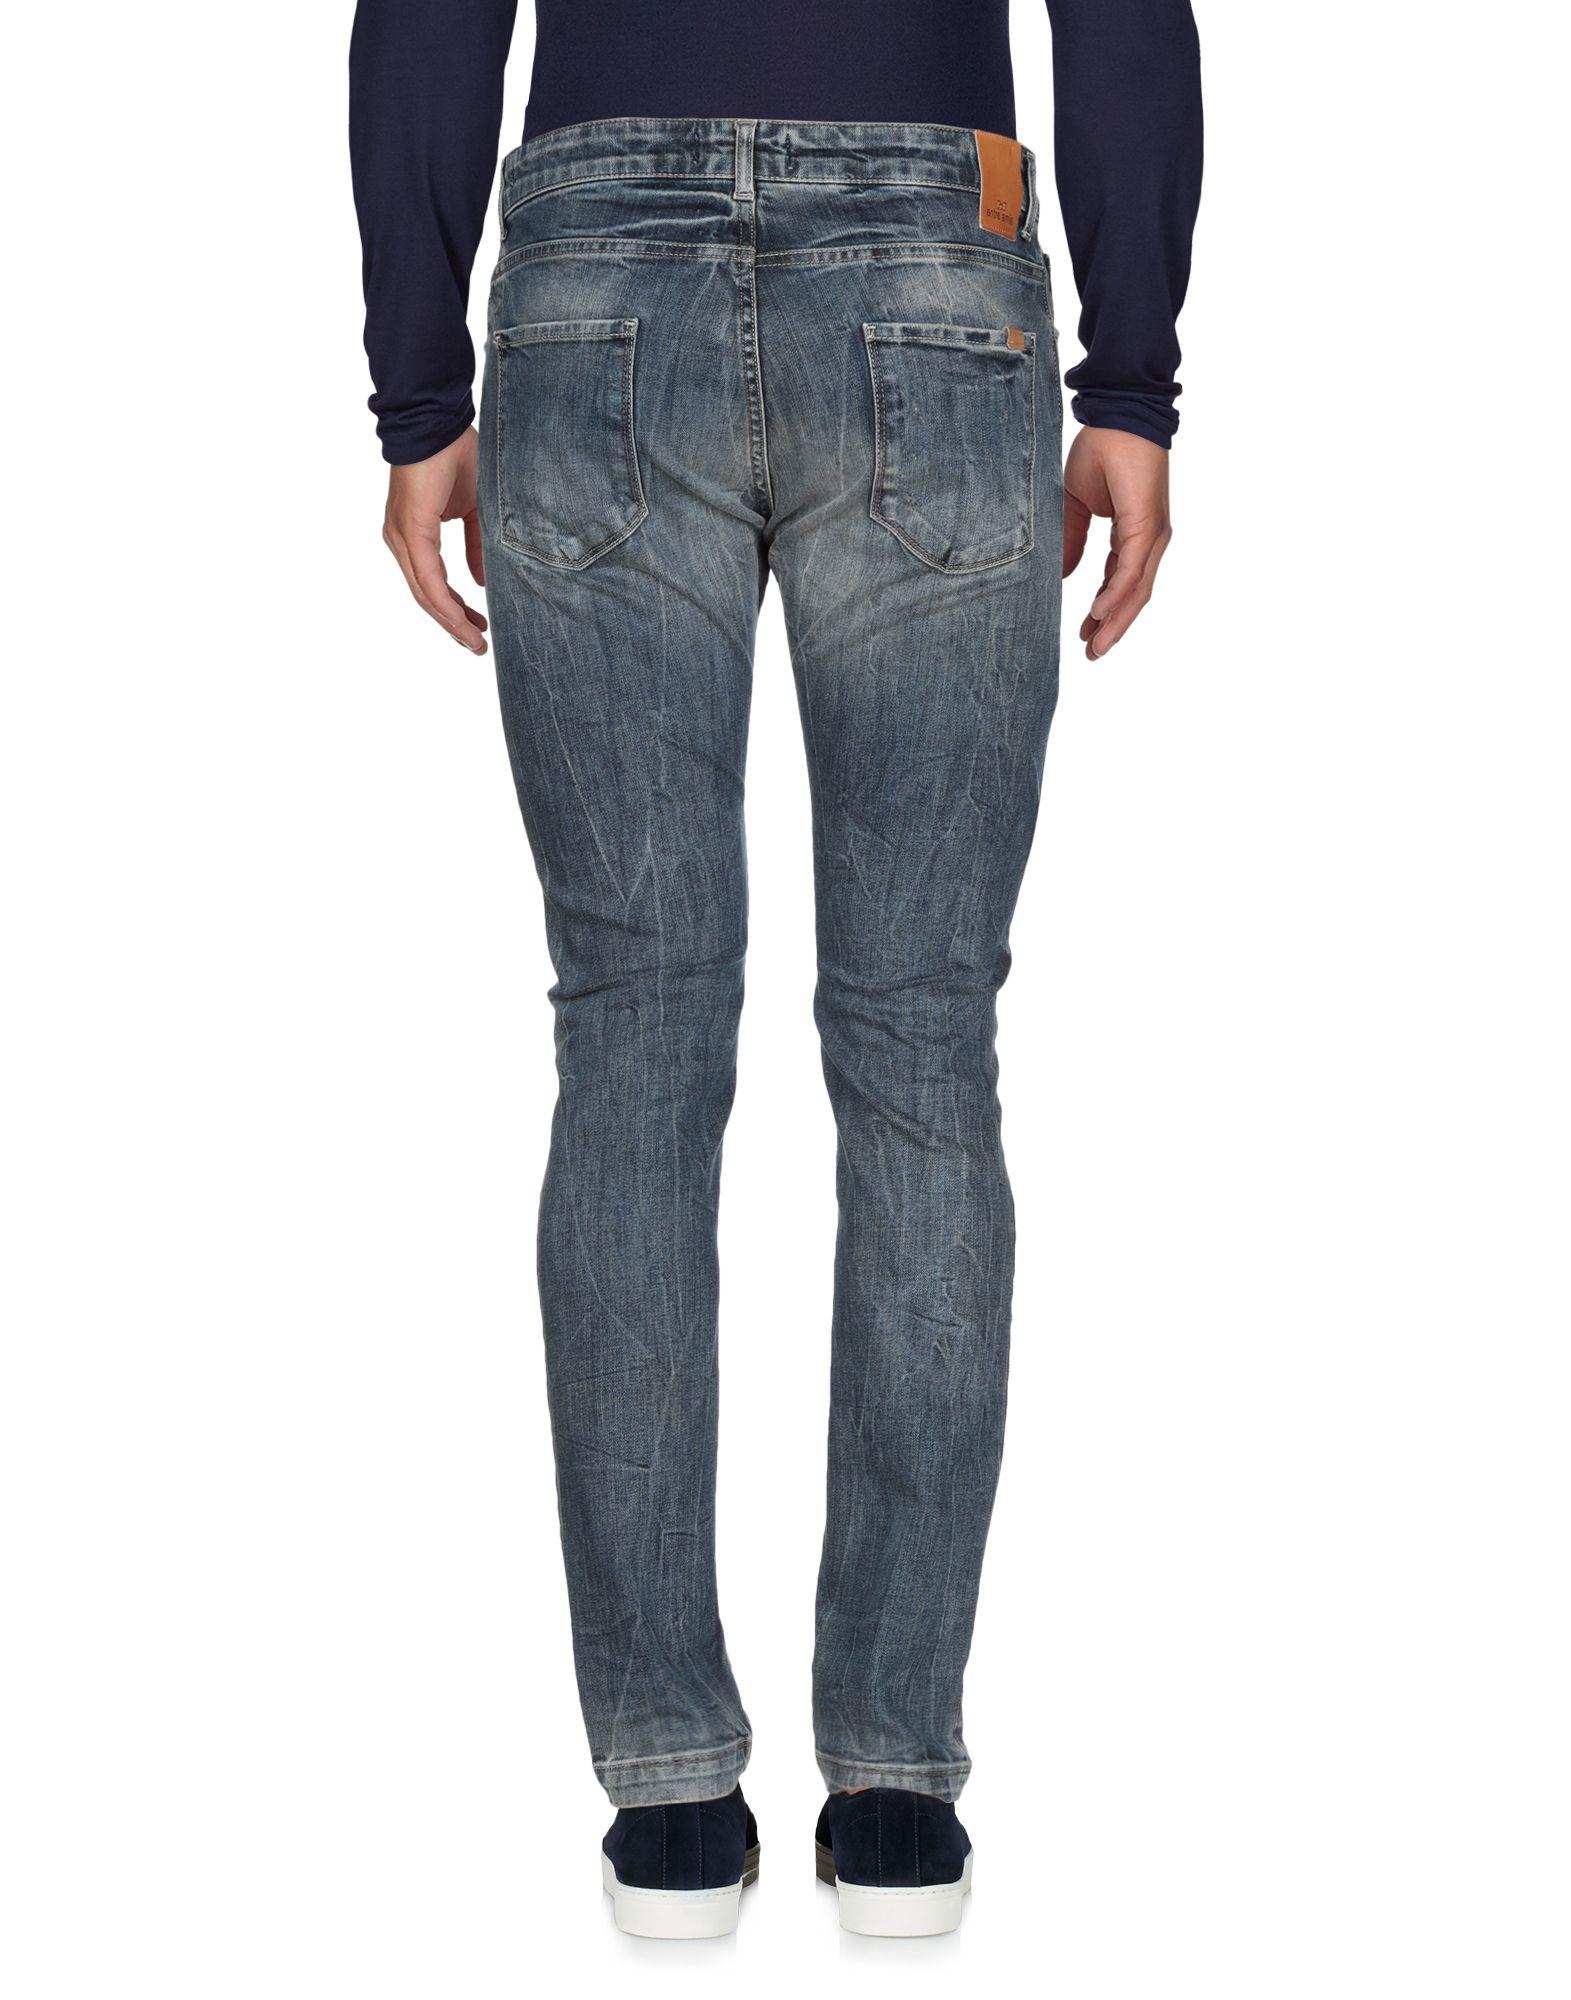 Pantaloni Jeans Uomo Entre Amis Uomo Jeans - 42685010UN 34a461